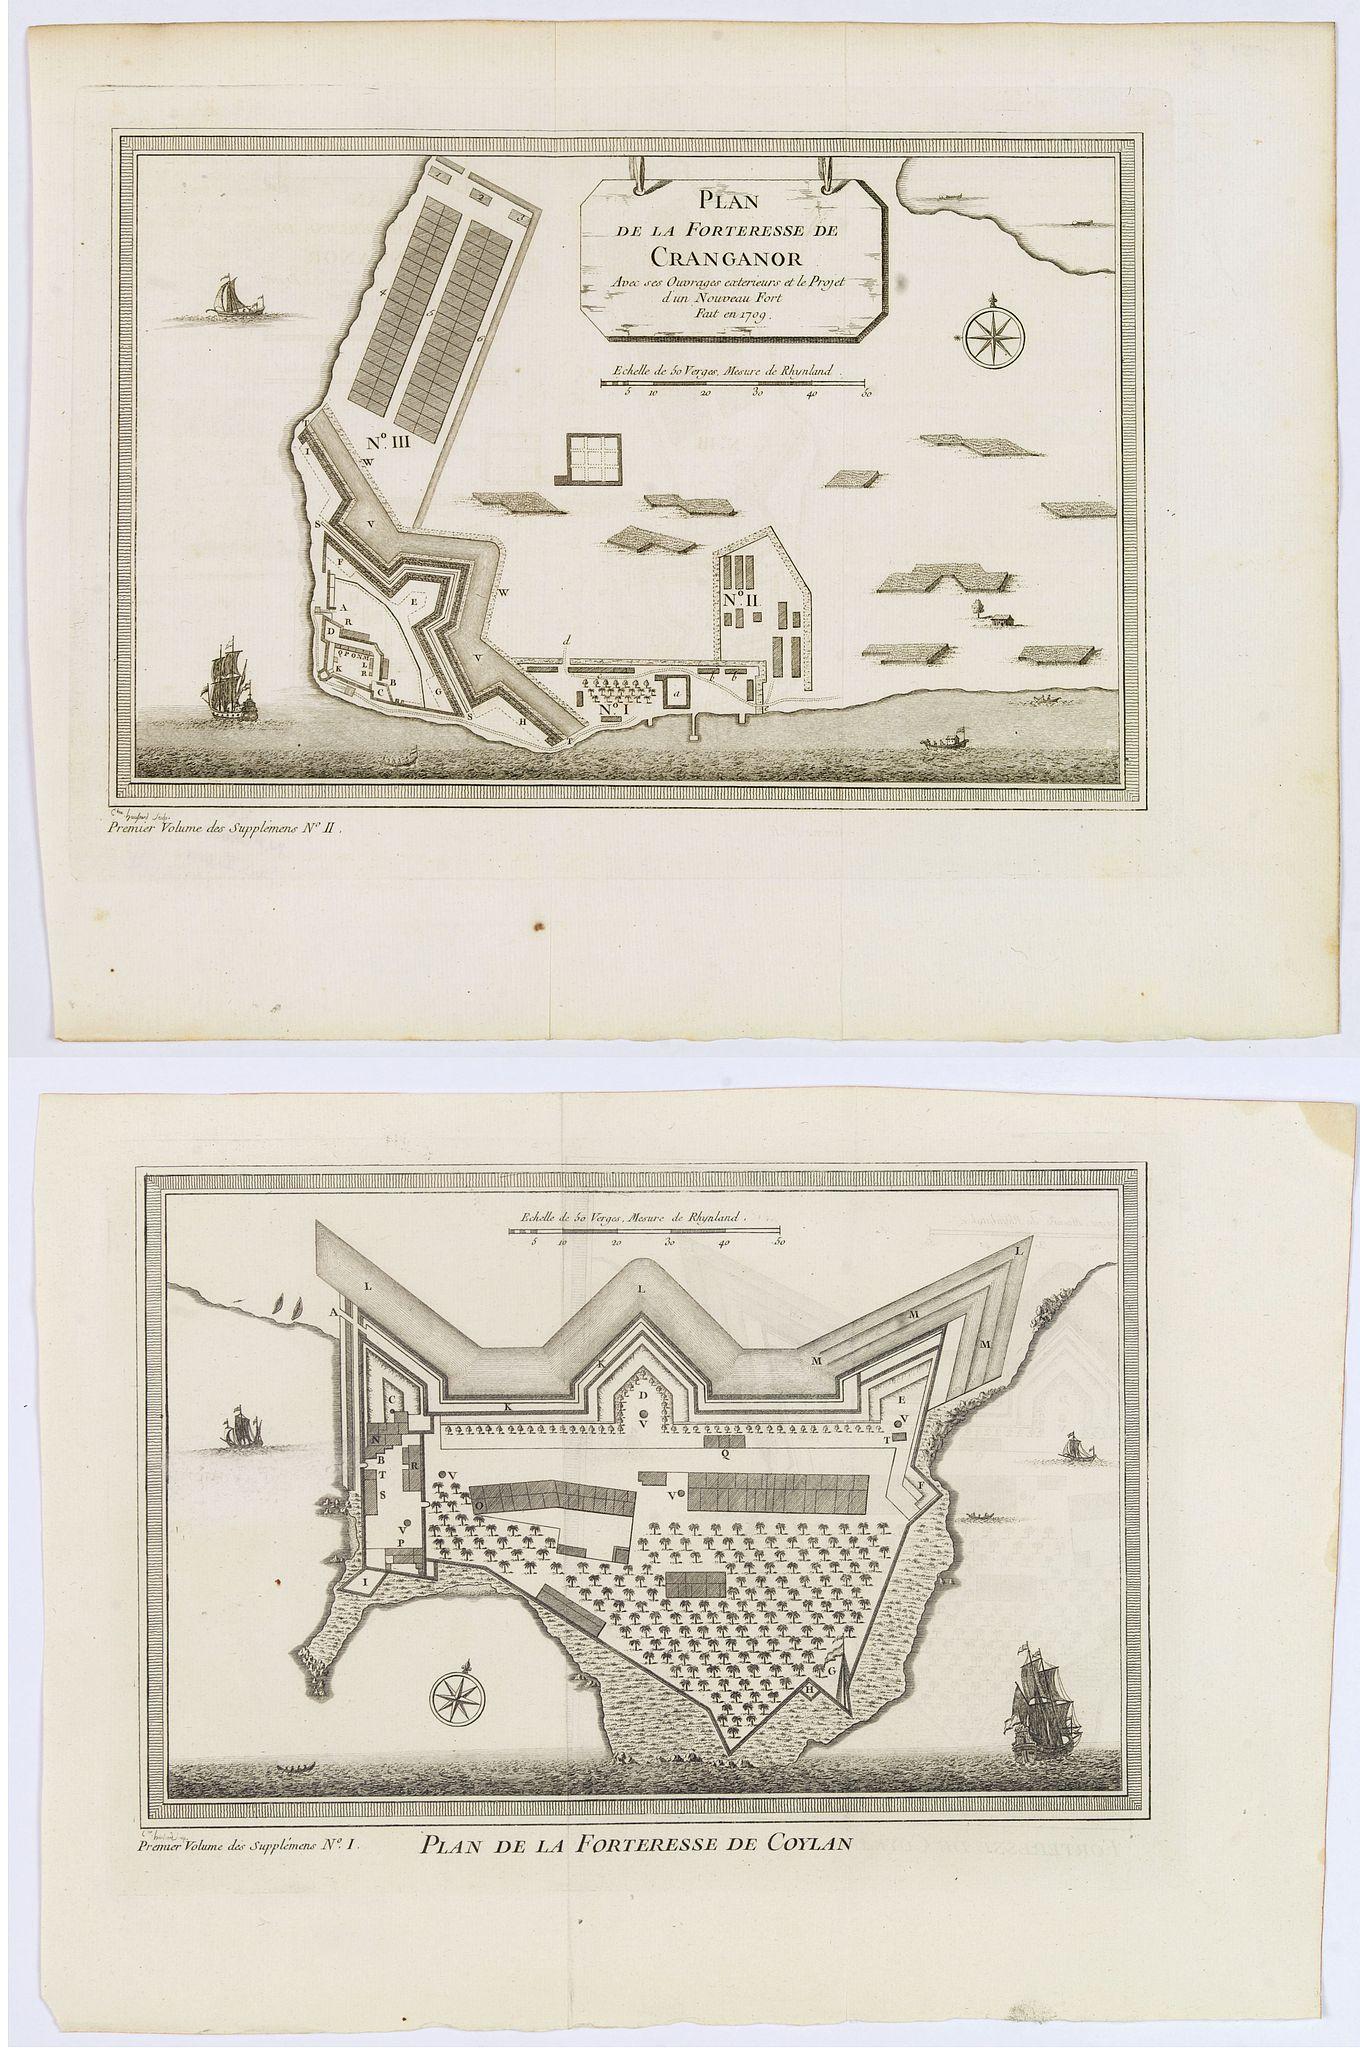 BELLIN, J.N. - Plan de la Forteresse de Coylan / Plan de la Forteresse de Cranganor. . .